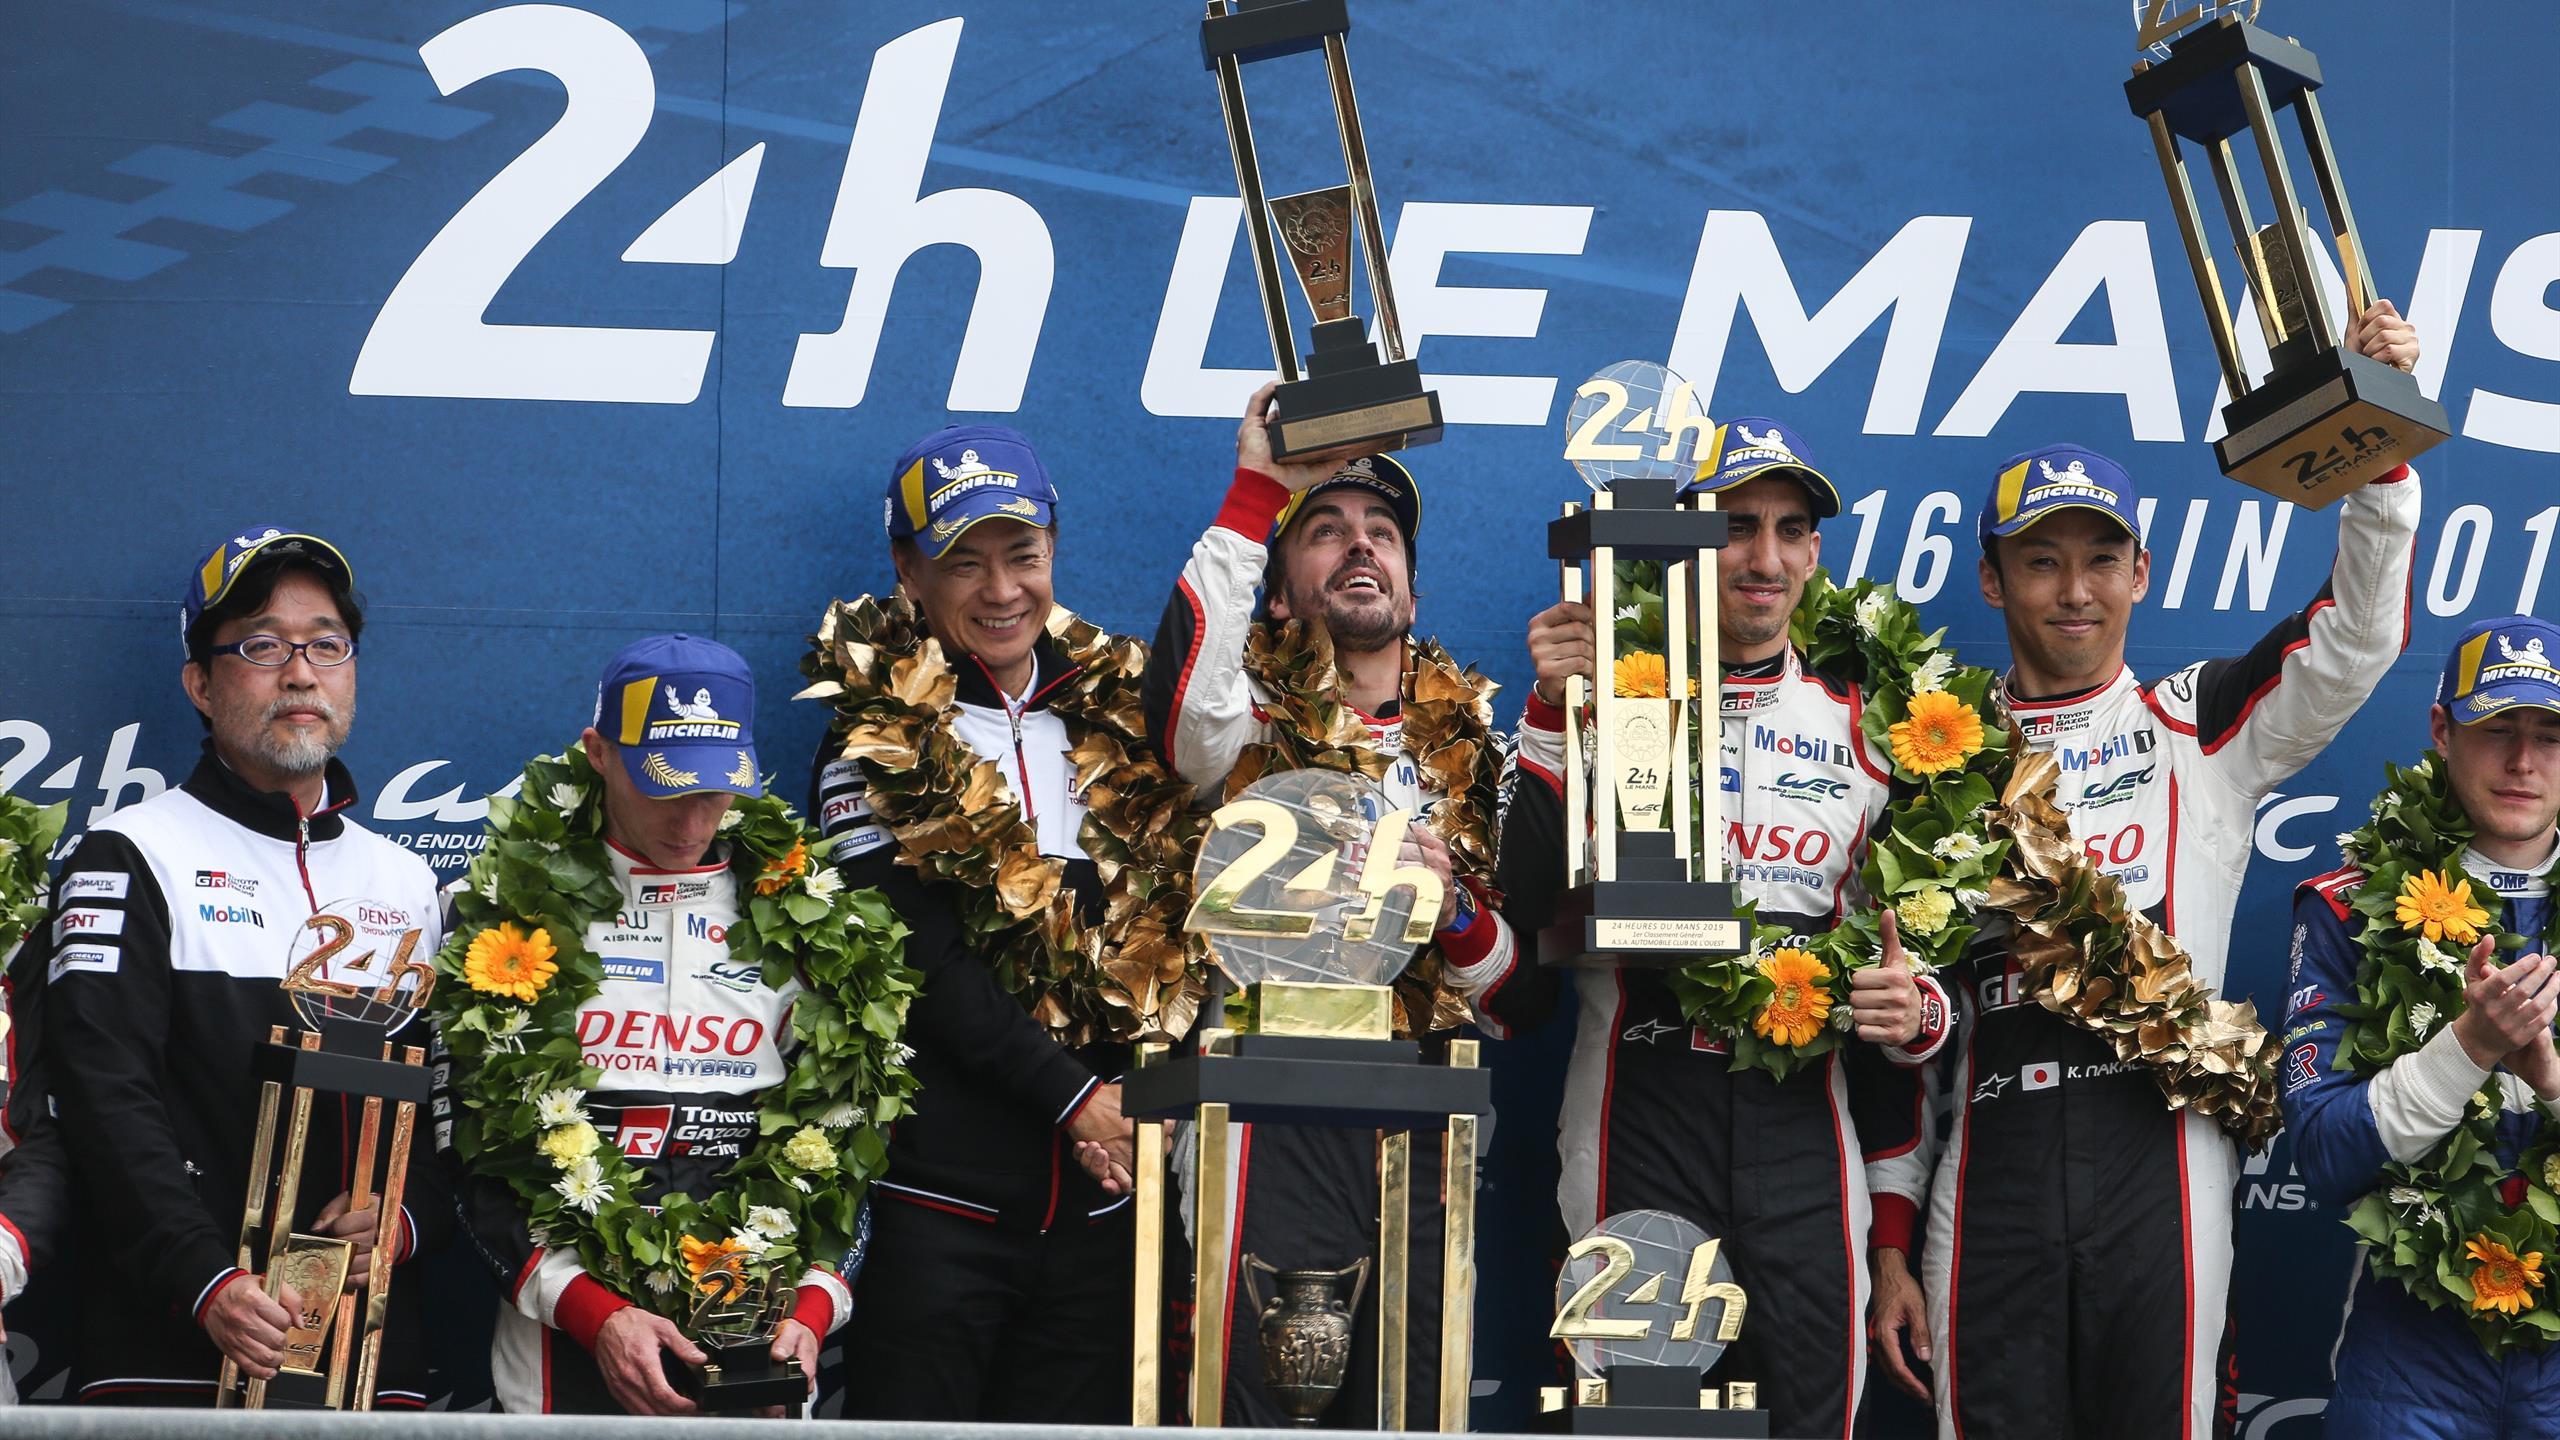 24 Hours of Le Mans 2020: Schedule, TV details, entry list, dates, tickets, circuit, race info